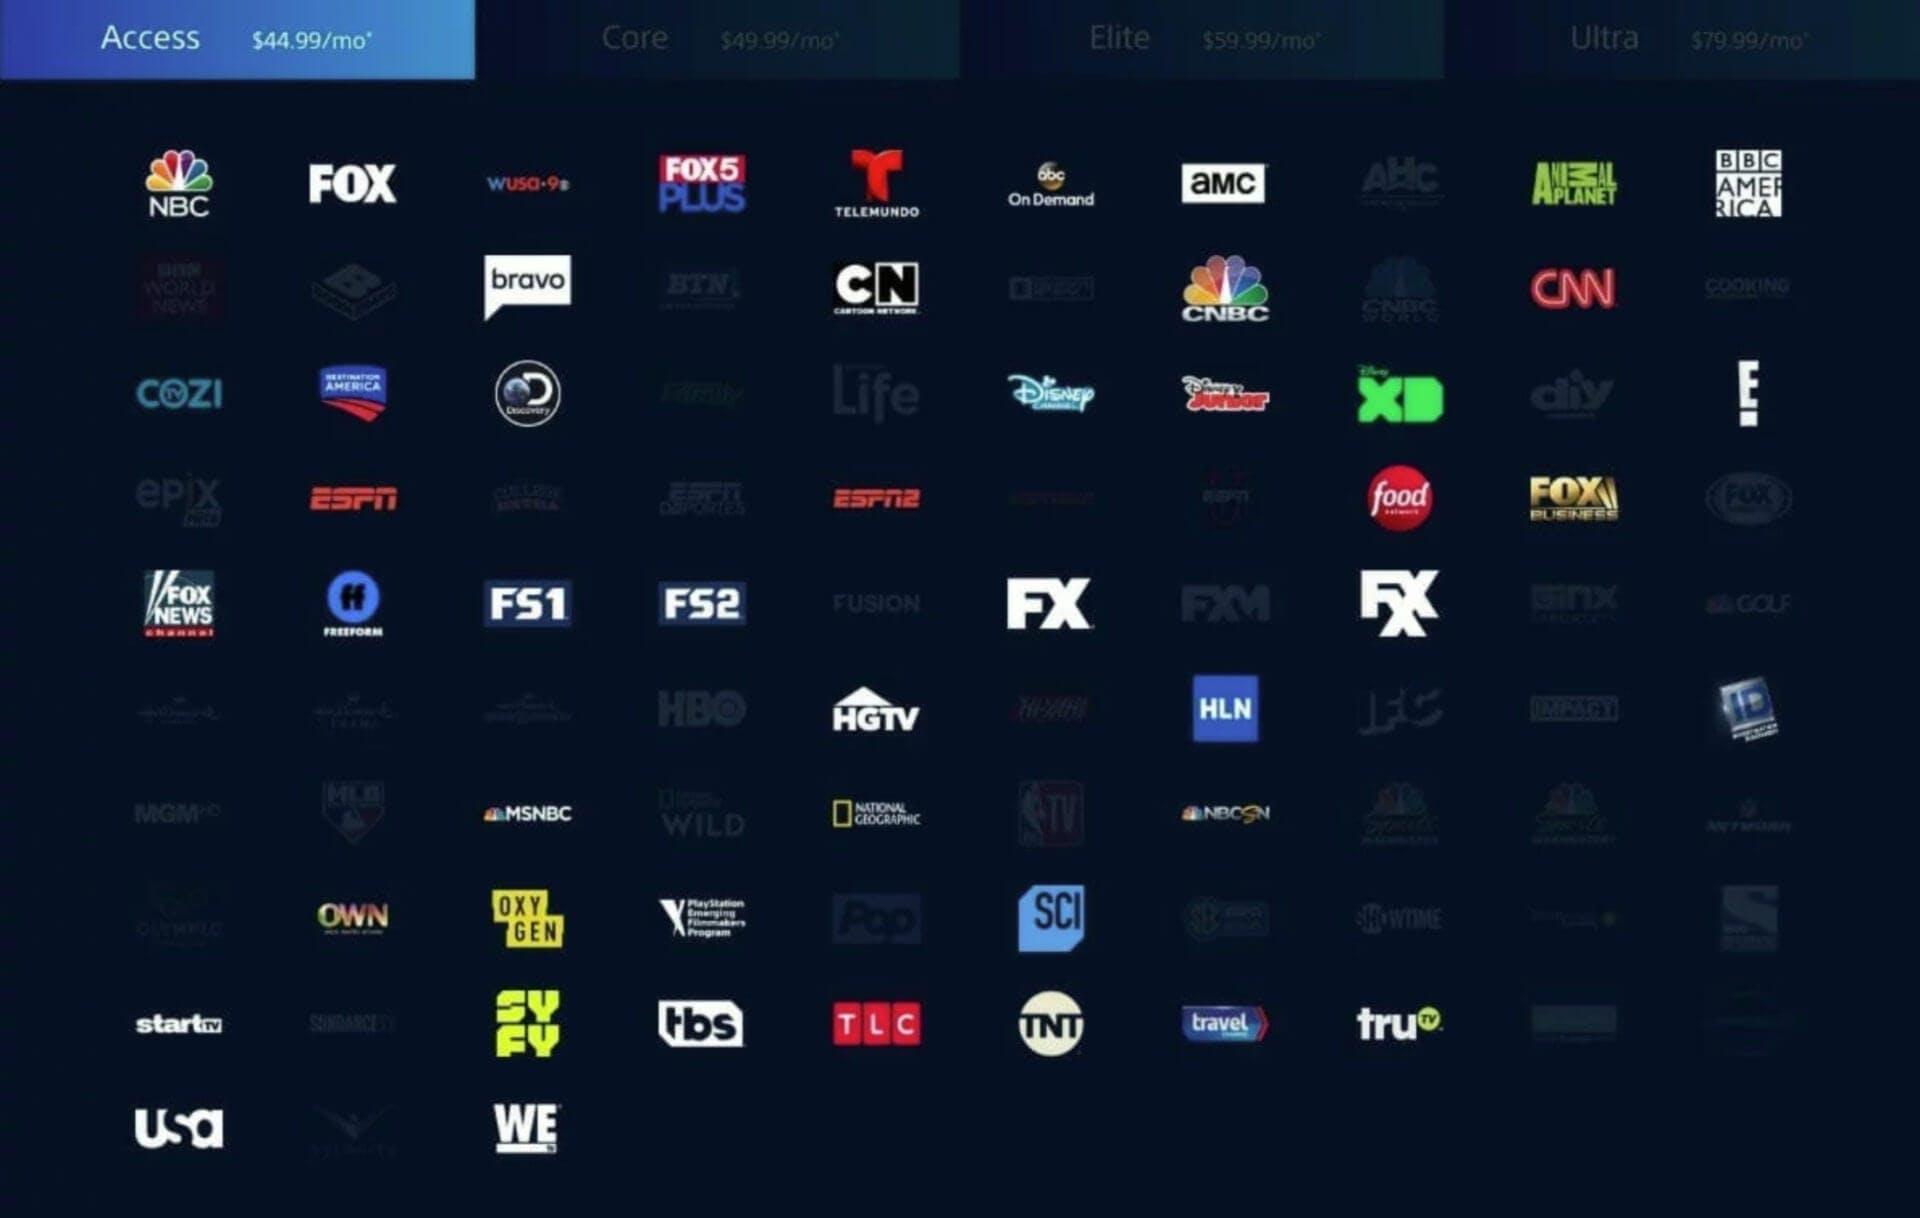 patriots redskins playstation vue streaming nfl